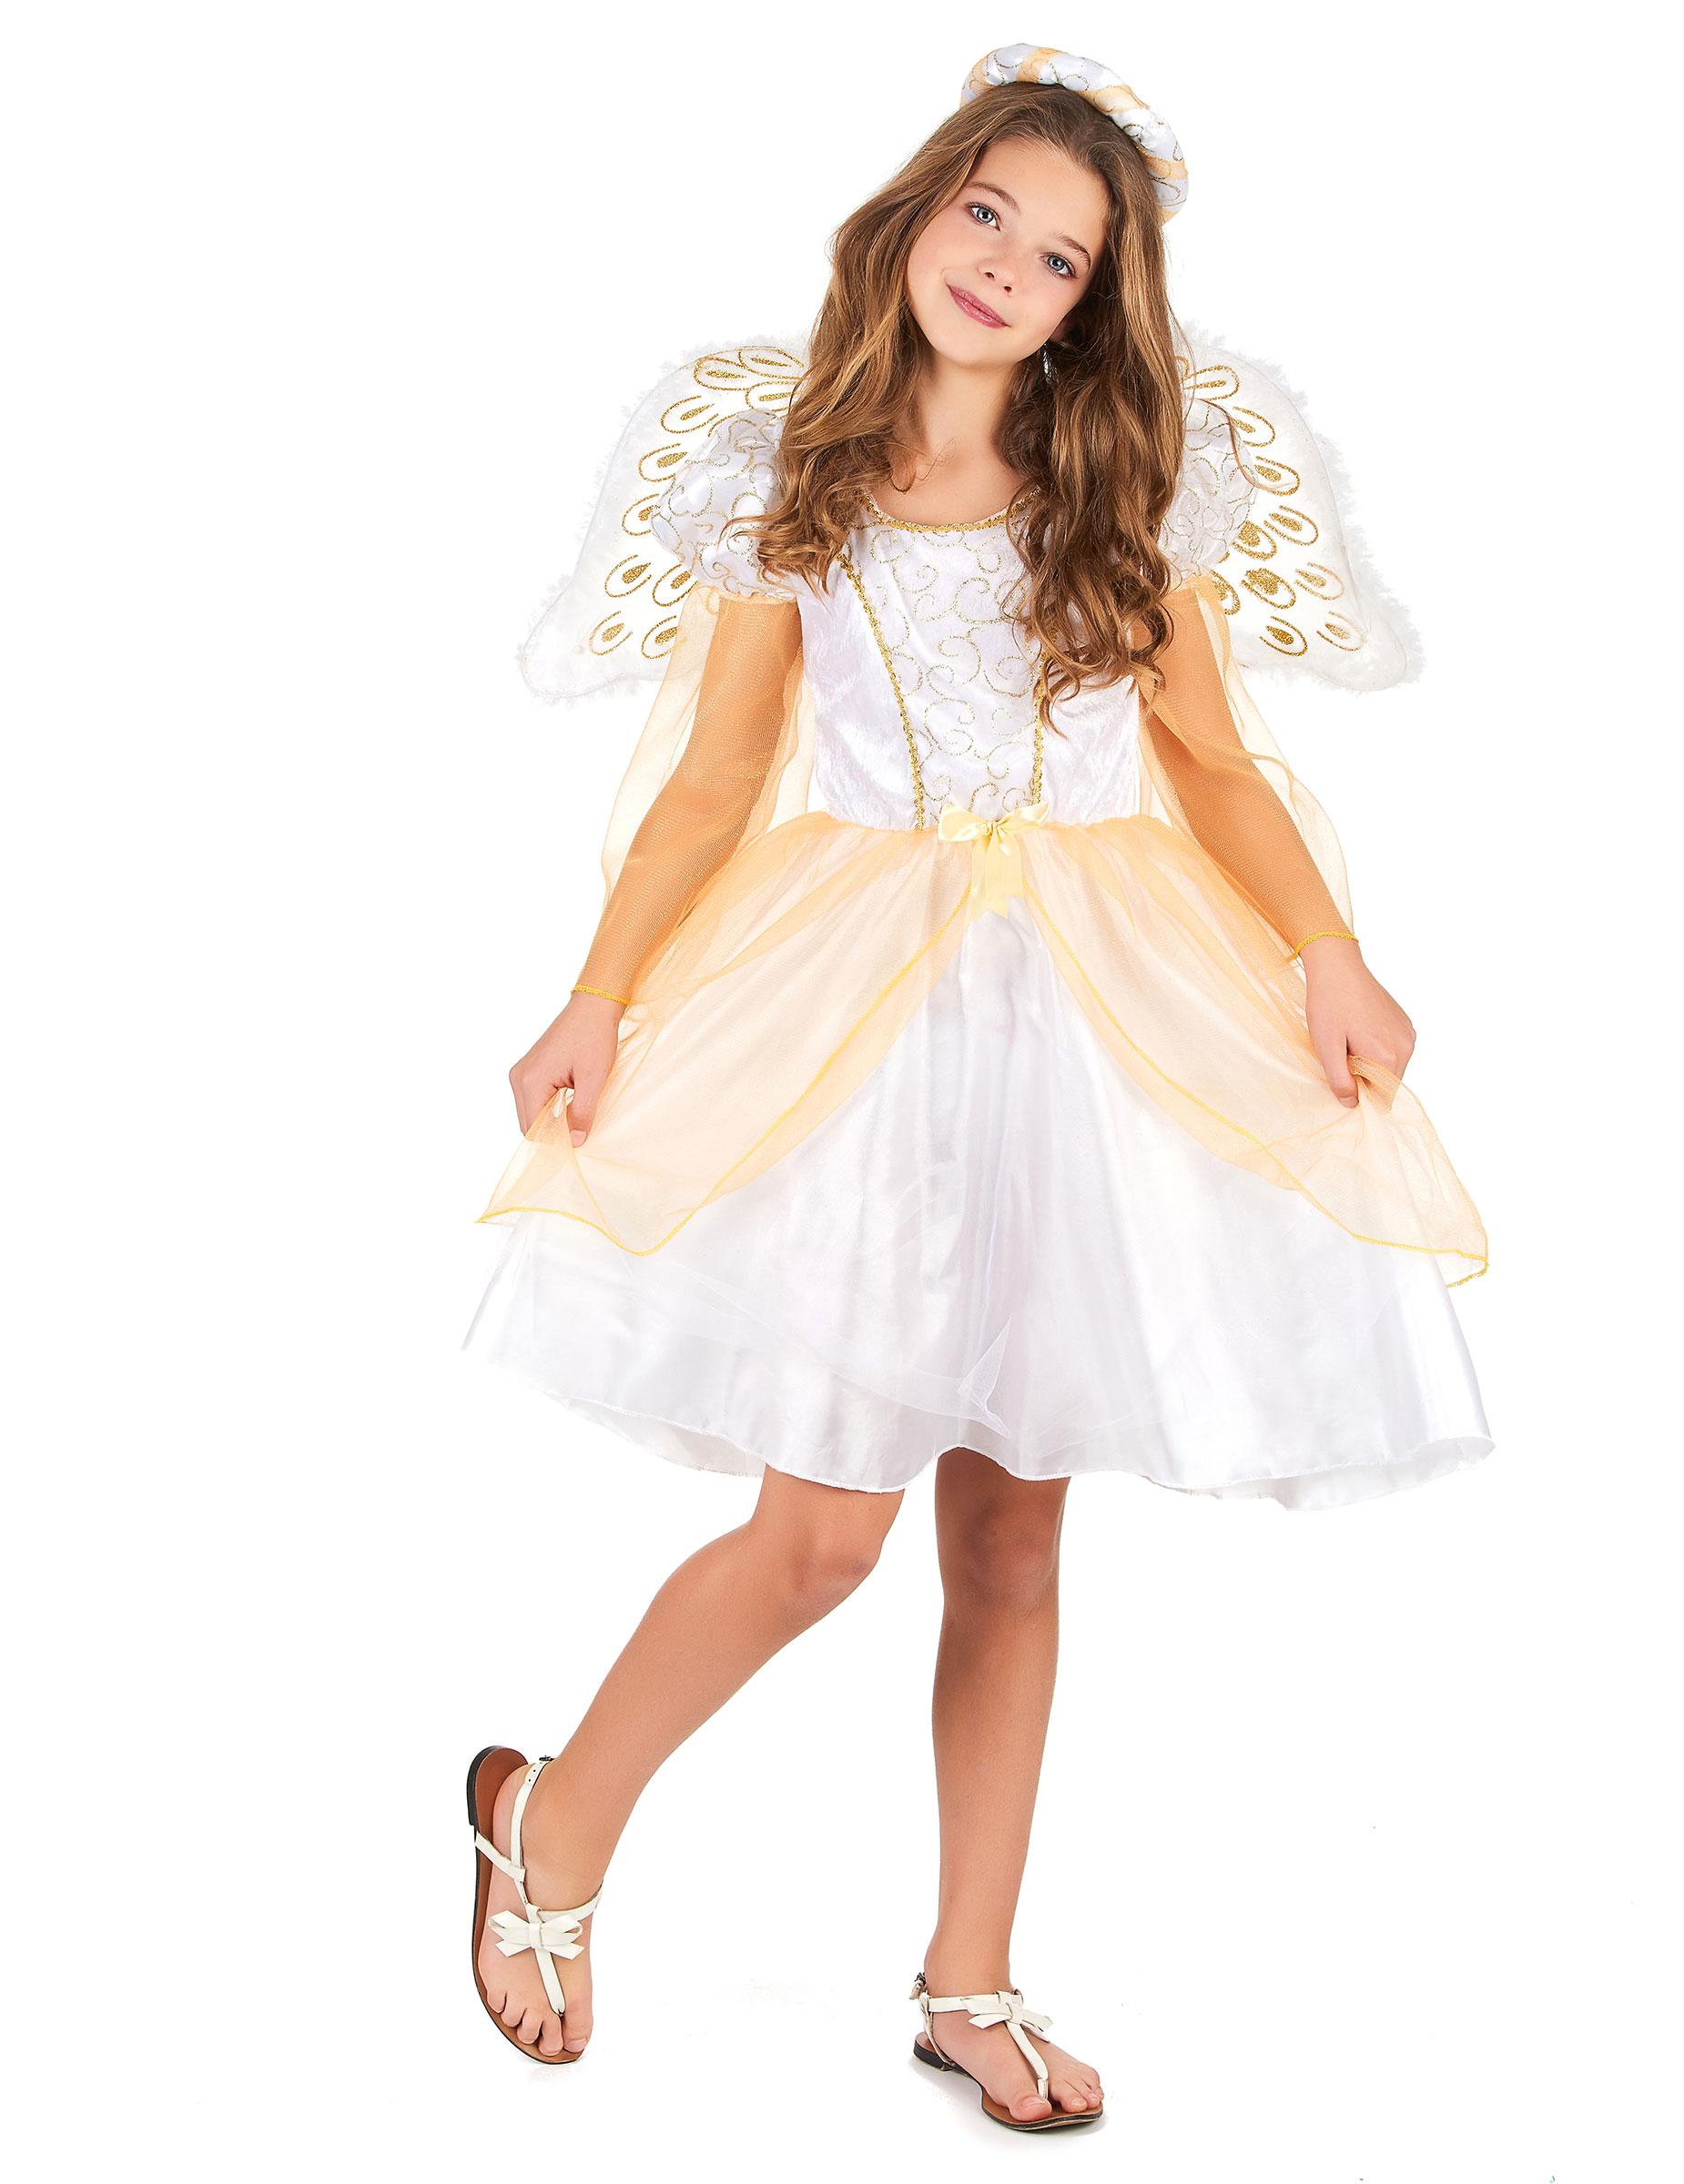 Engel Kinder Kostum Weiss Gold Gunstige Faschings Kostume Bei